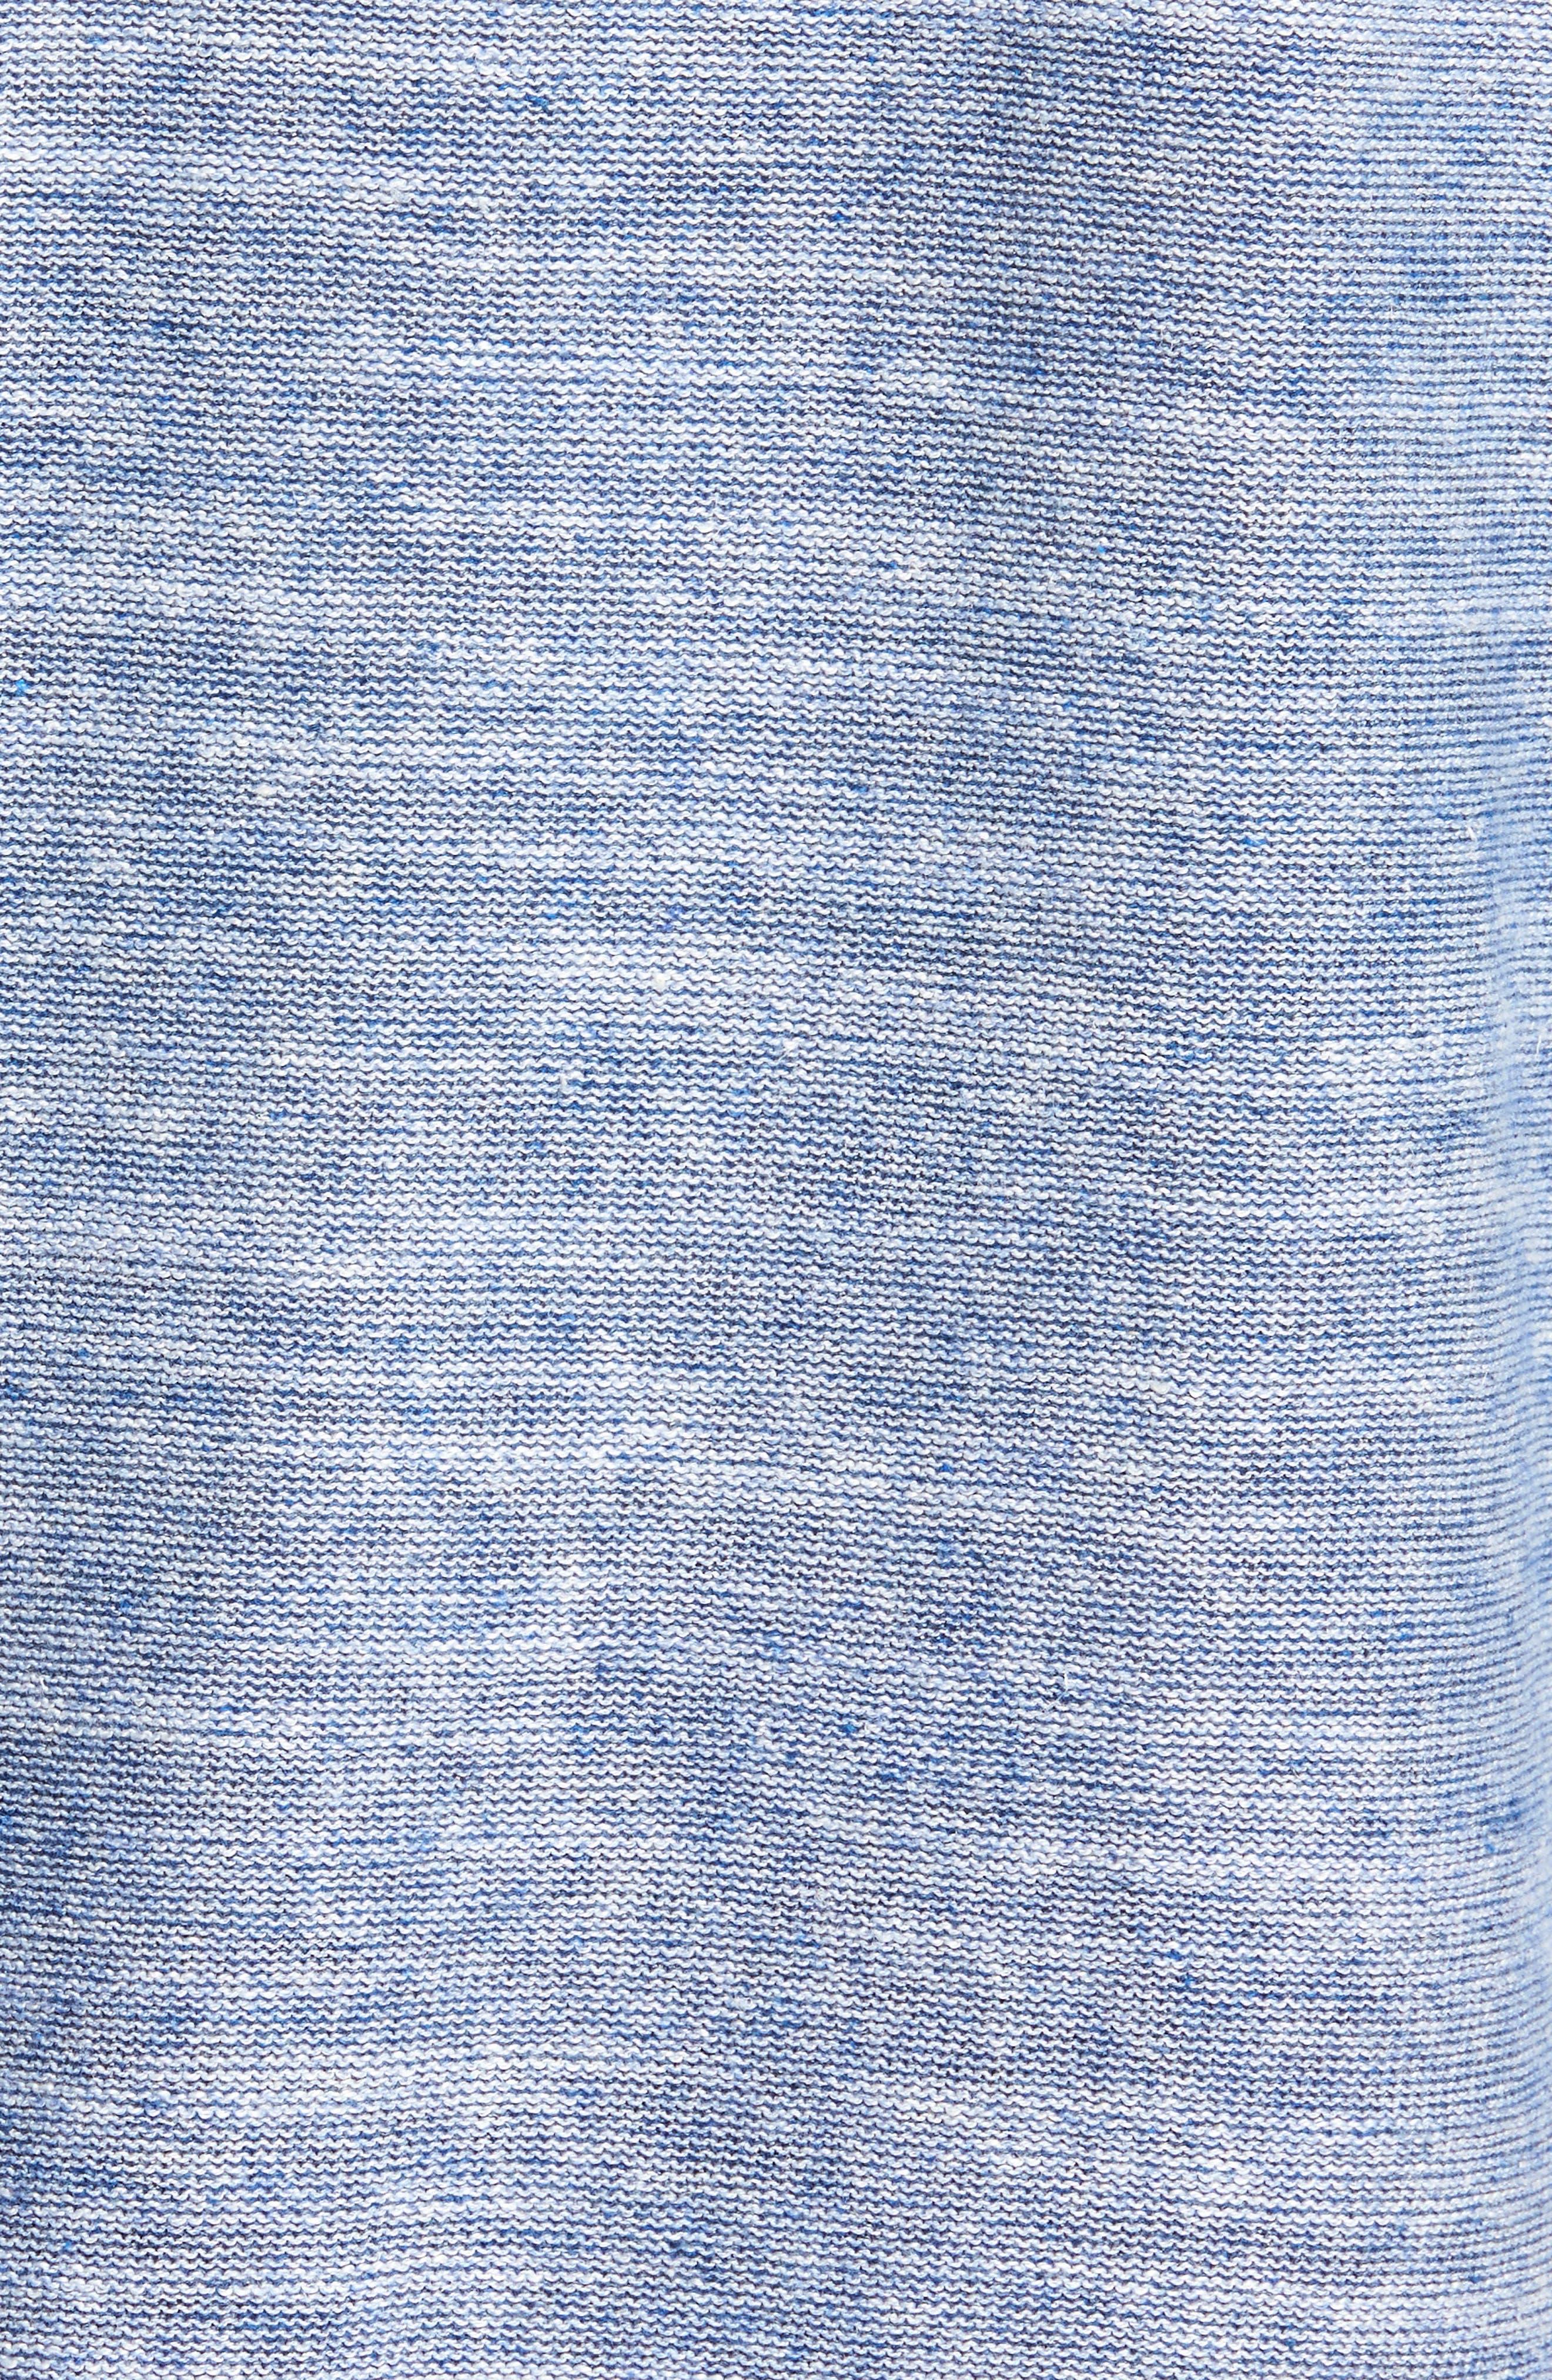 Sandy Bay Half-Zip Pullover,                             Alternate thumbnail 5, color,                             Galaxy Blue Heather